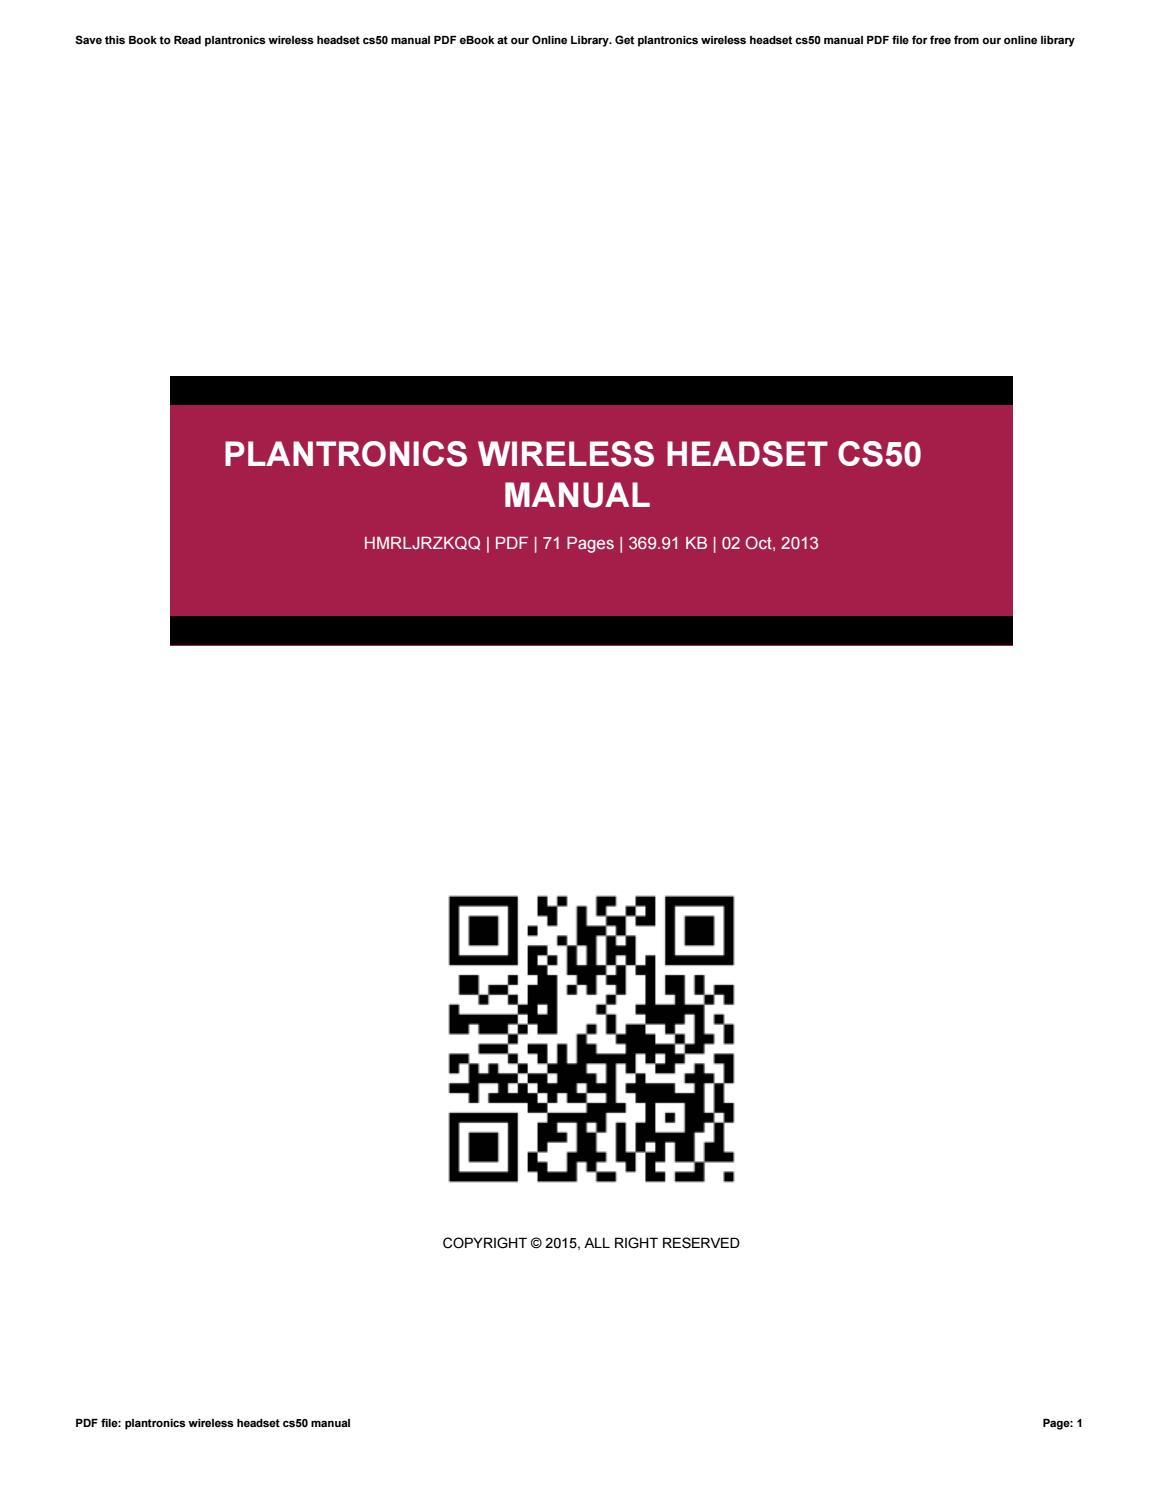 Plantronics Wireless Headset Cs50 Manual By Humphriesshauna80 Issuu